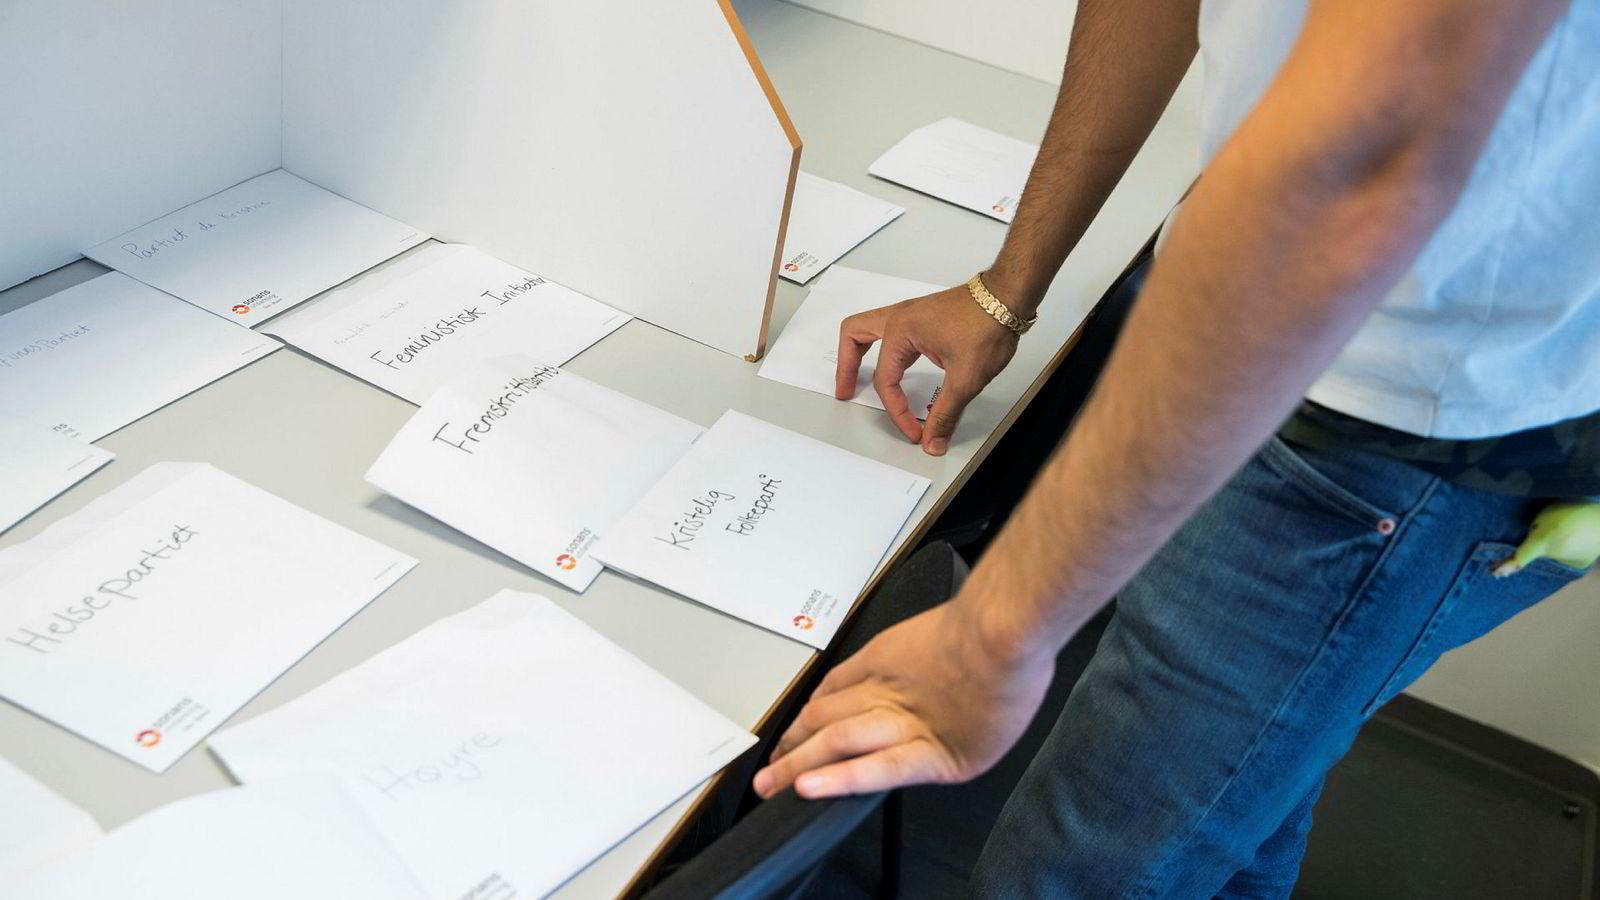 En elev ved Heltberg videregående skole i Oslo må ta sitt valg under skolevalget mandag.